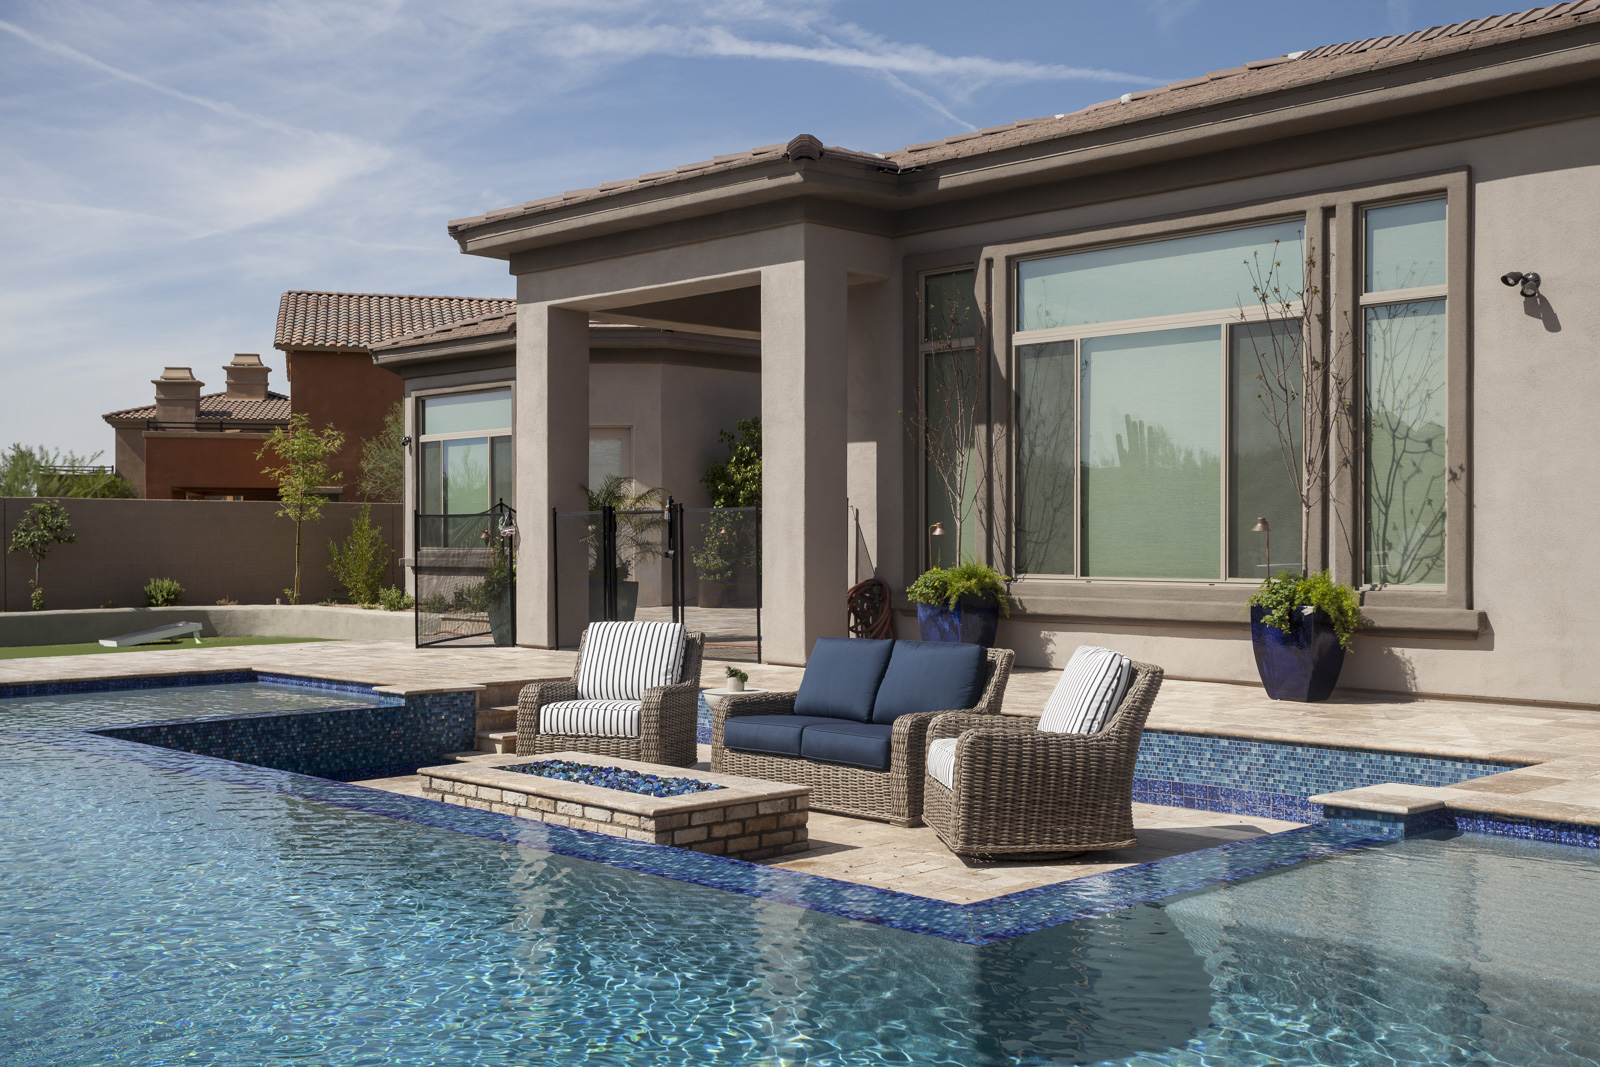 Luxury Backyards — Presidential Pools, Spas & Patio on Luxury Backyard Patios id=21474